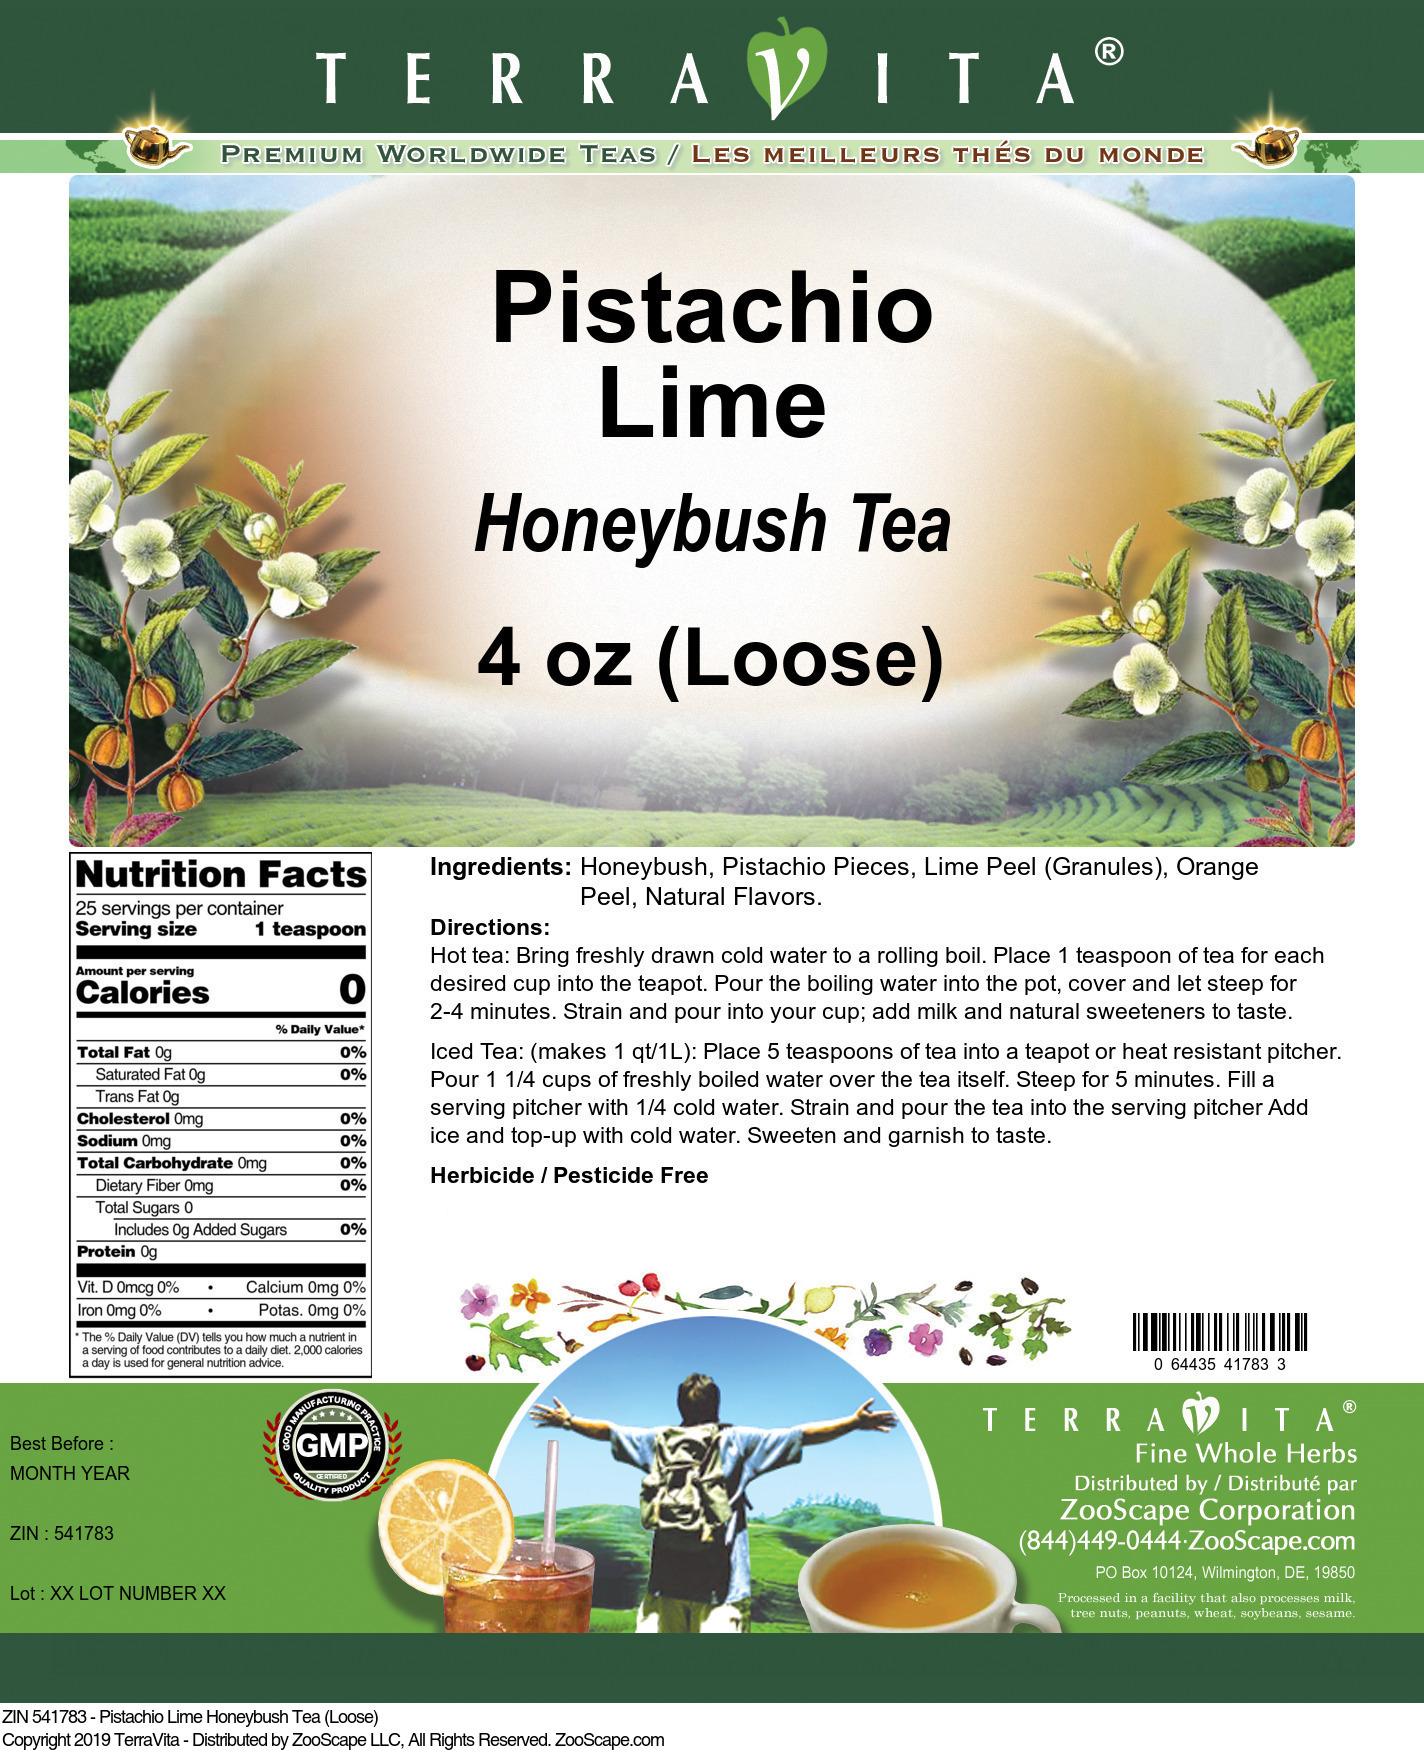 Pistachio Lime Honeybush Tea (Loose)